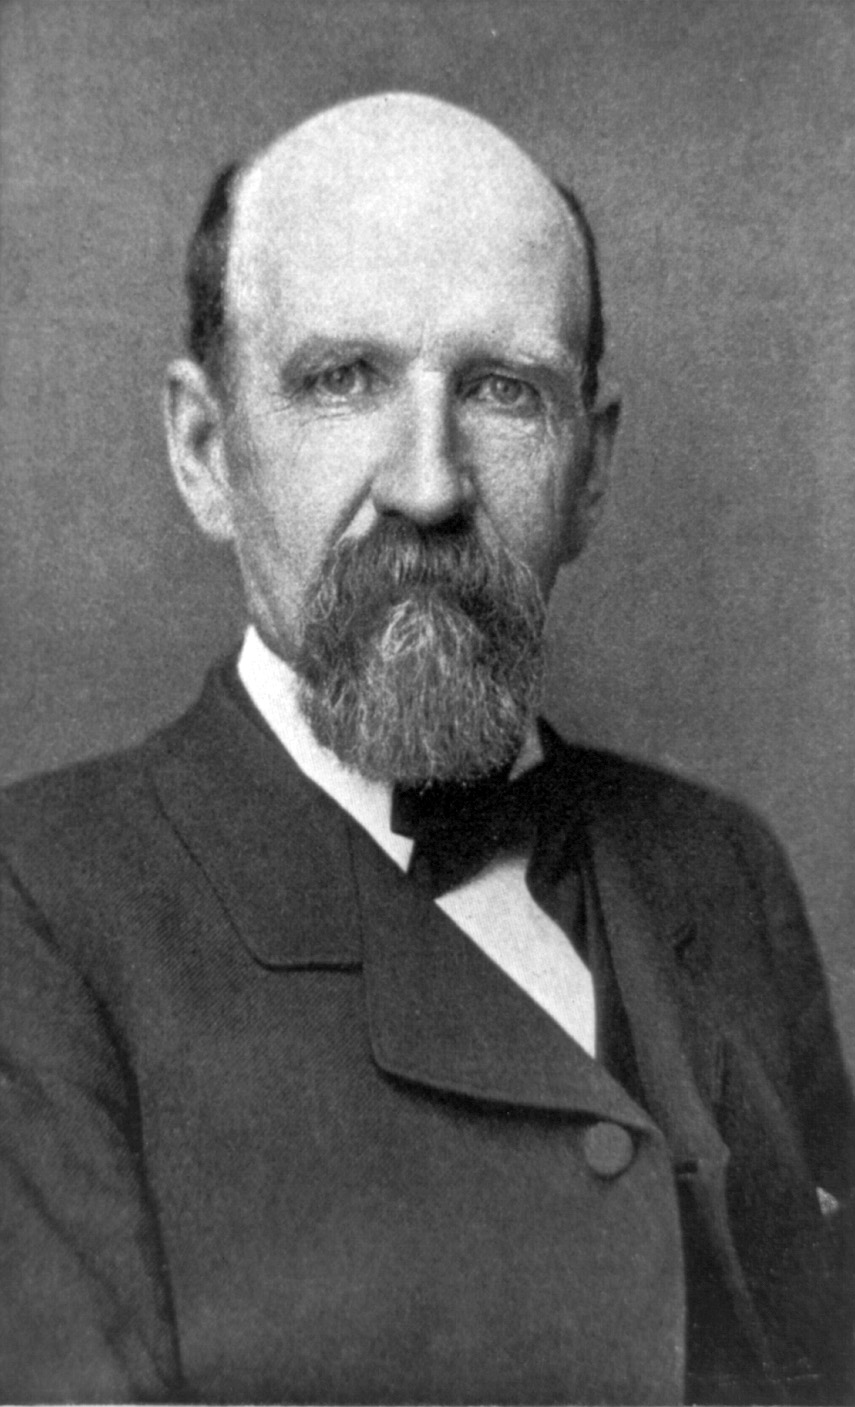 Joshua Slocum - Wikipedia